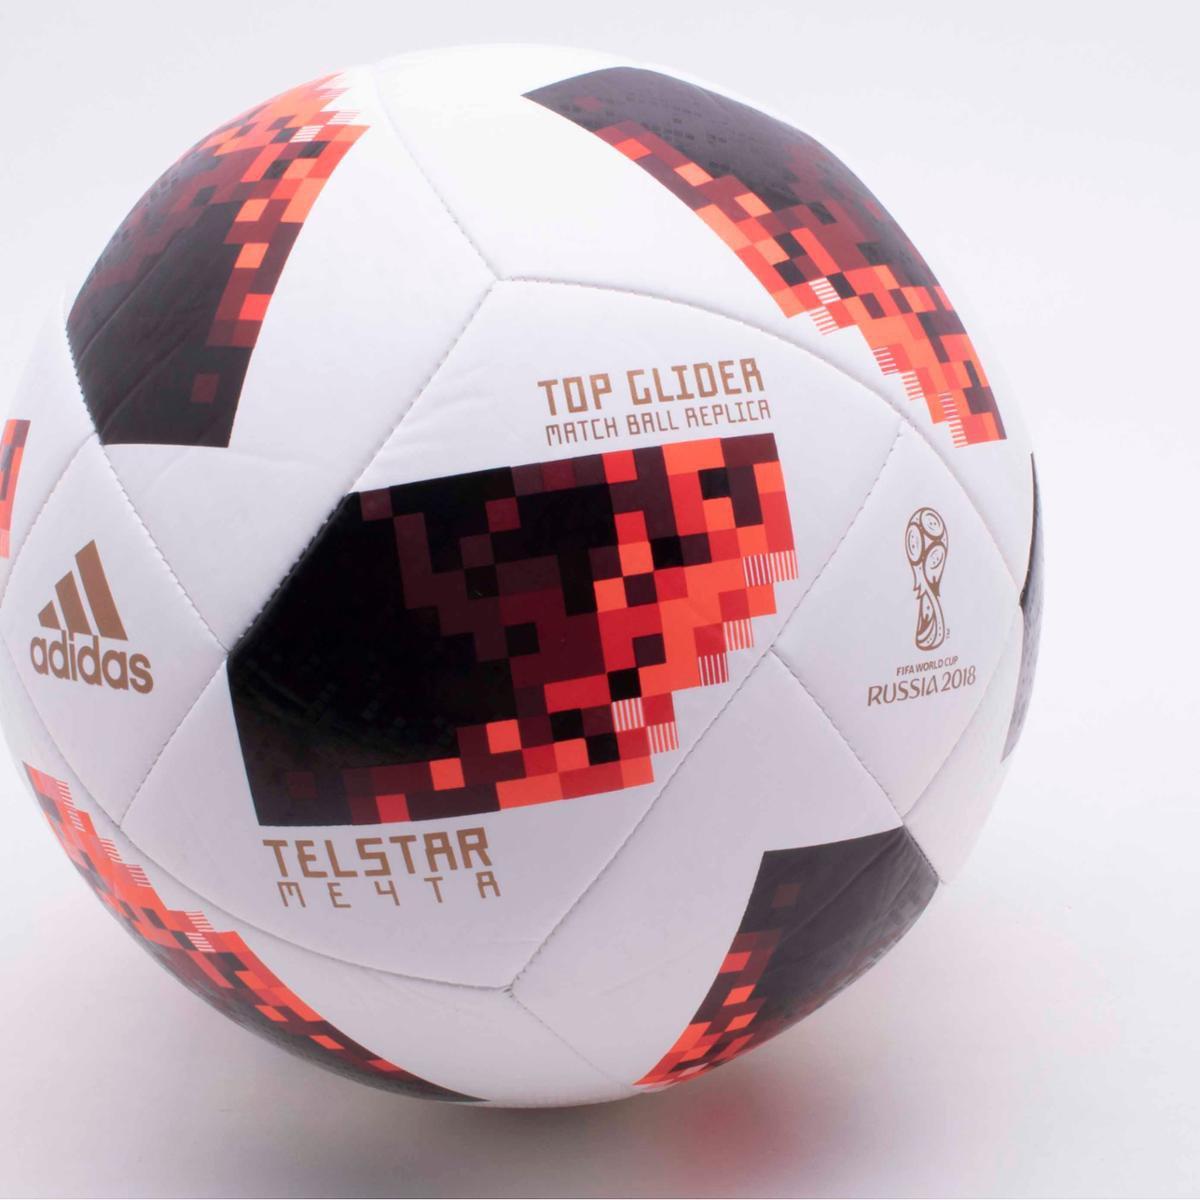 ... Bola de Futebol Campo Adidas Telstar 18 Top Glider Réplica Mata-Mata Copa  do Mundo ... aead606f5f37a